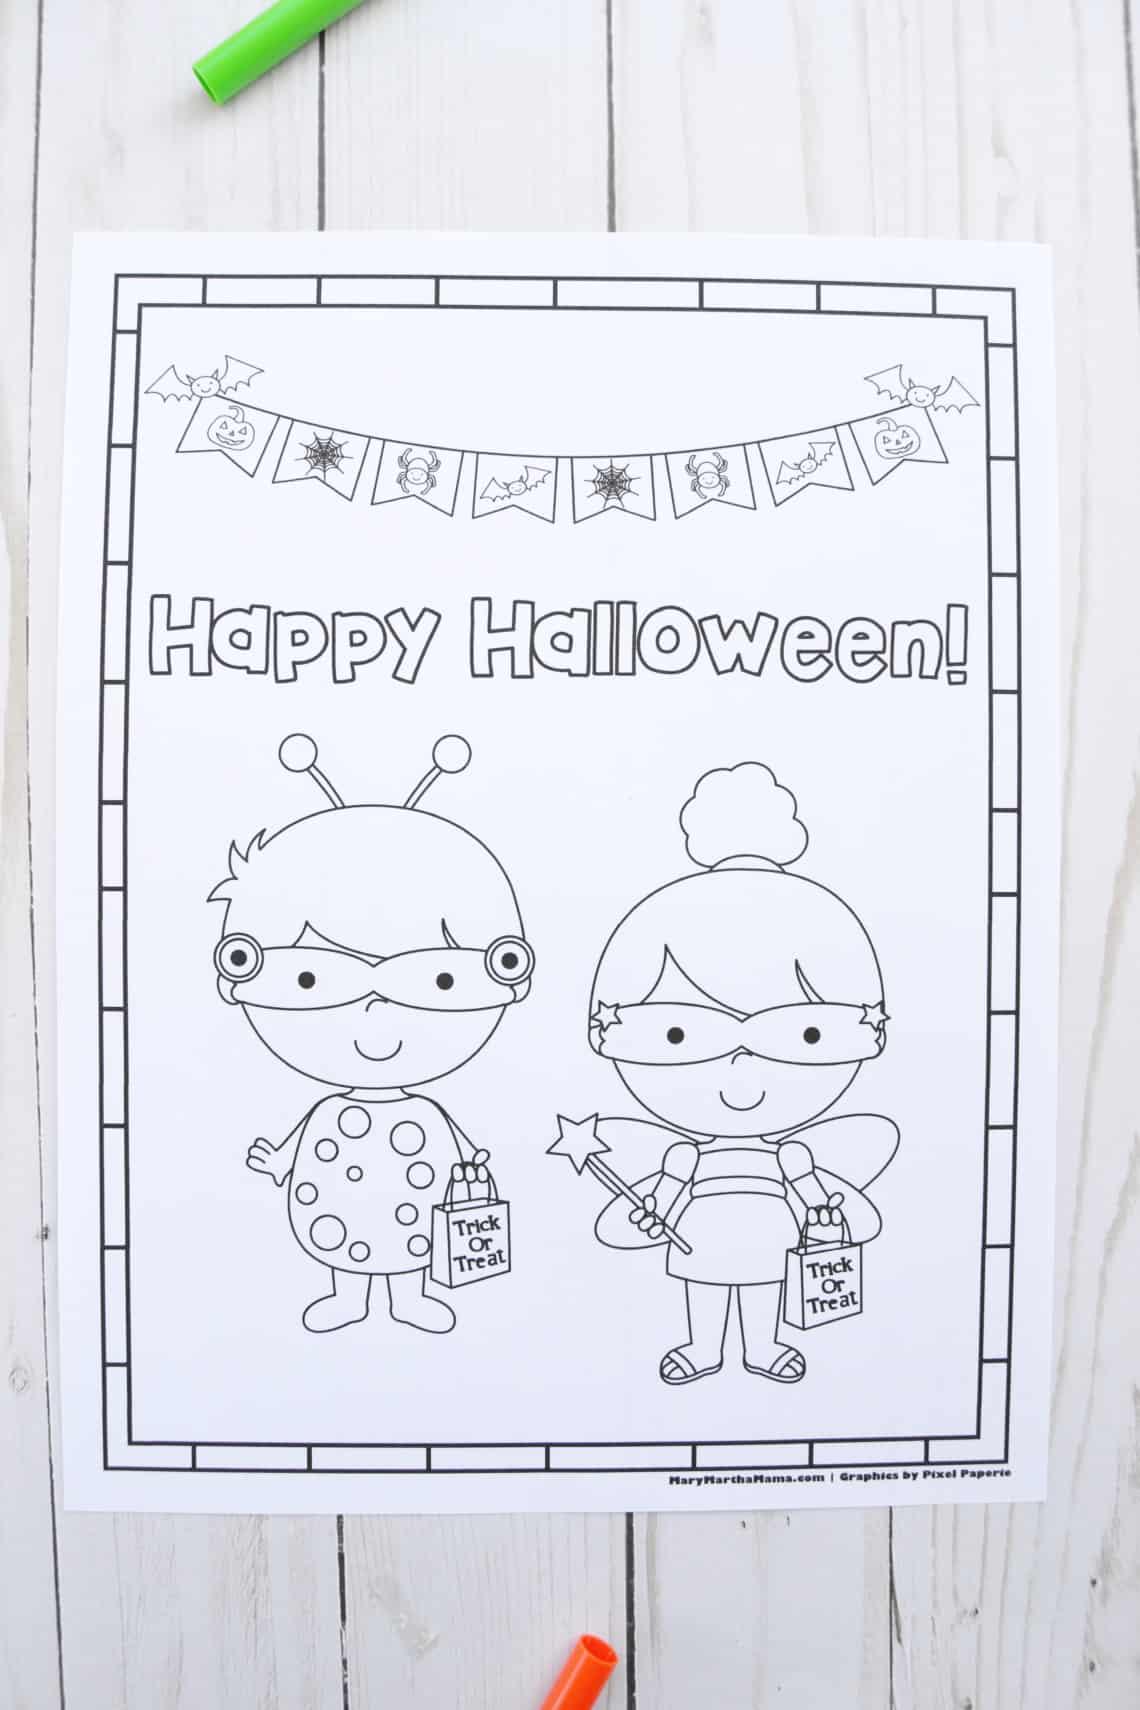 Free Printable Halloween Coloring Pages: Lady Bug + Princess